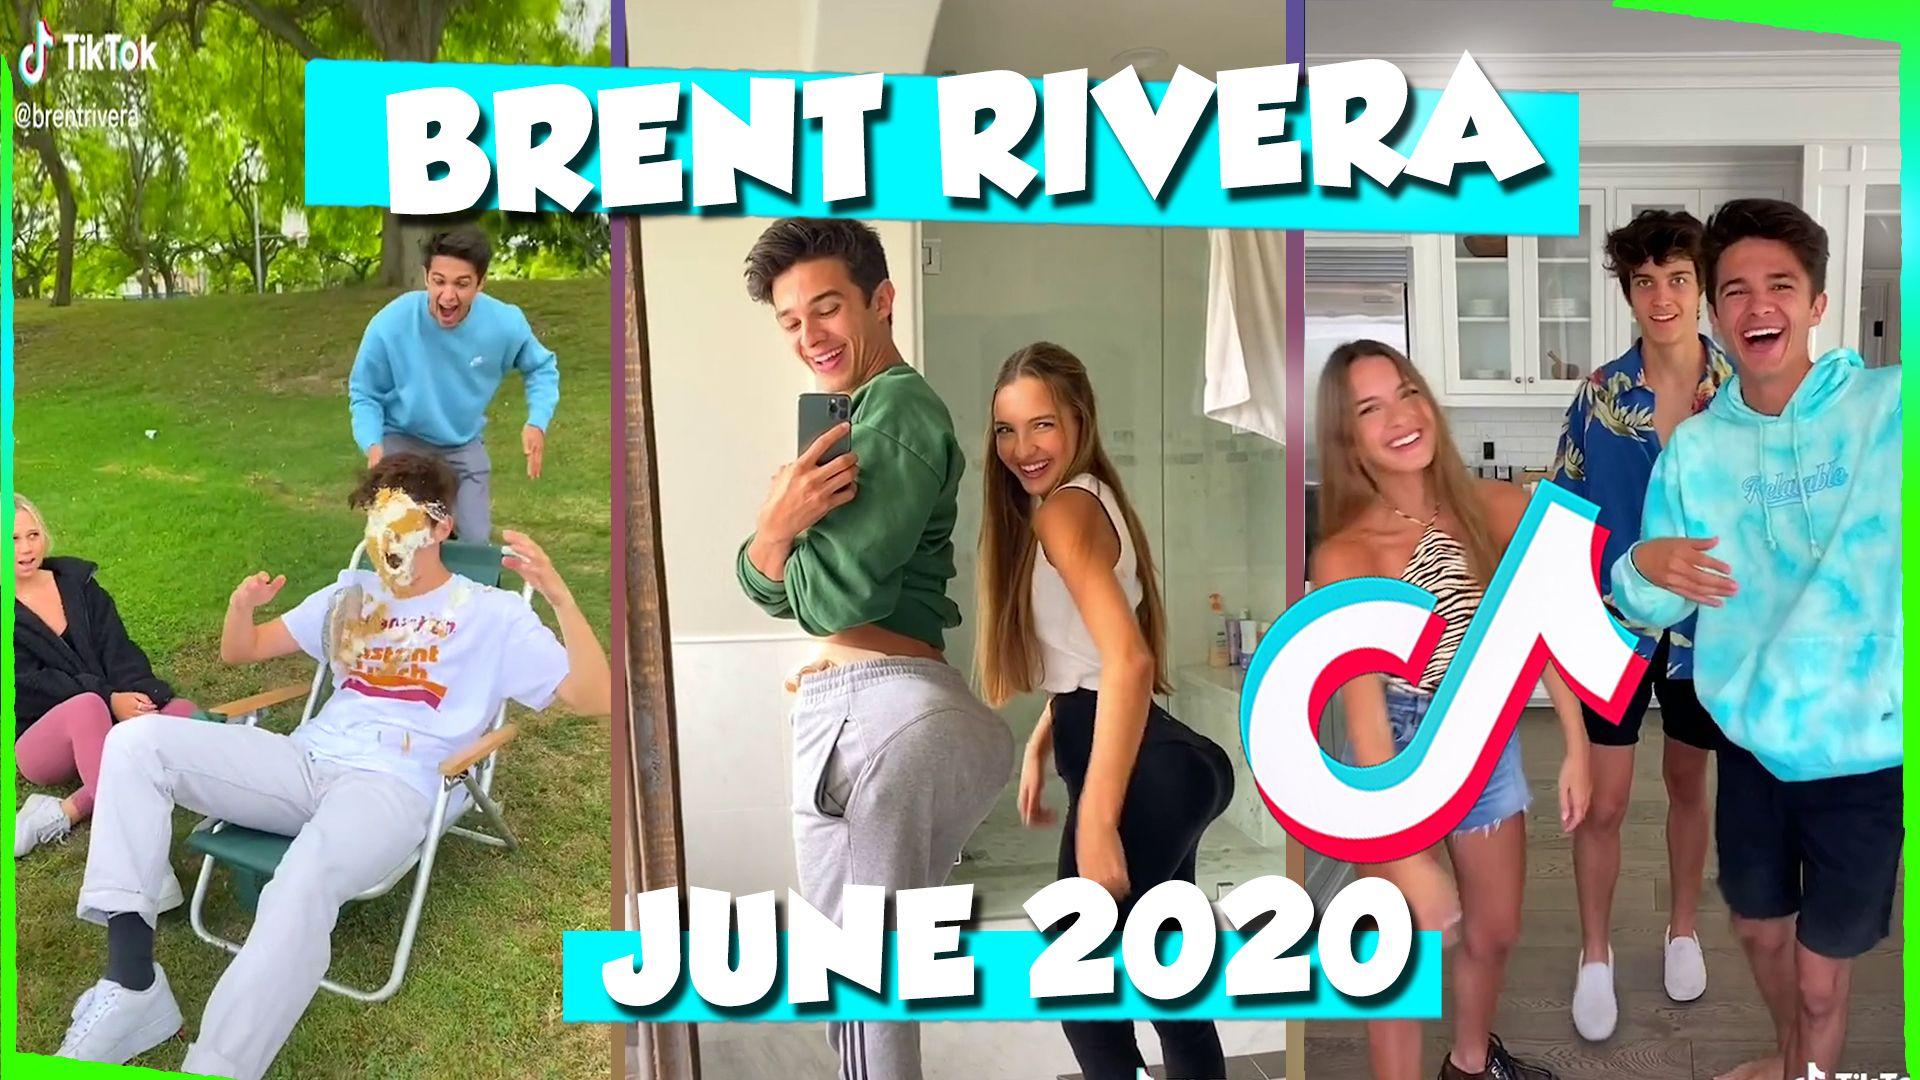 Brent Rivera Best June 2020 Tiktoks This Is Tiktok Watch The Best Of Brent Rivera Funny June 2020 Tiktok Videos Thisistiktok Bre Brent Rivera Brent Funny